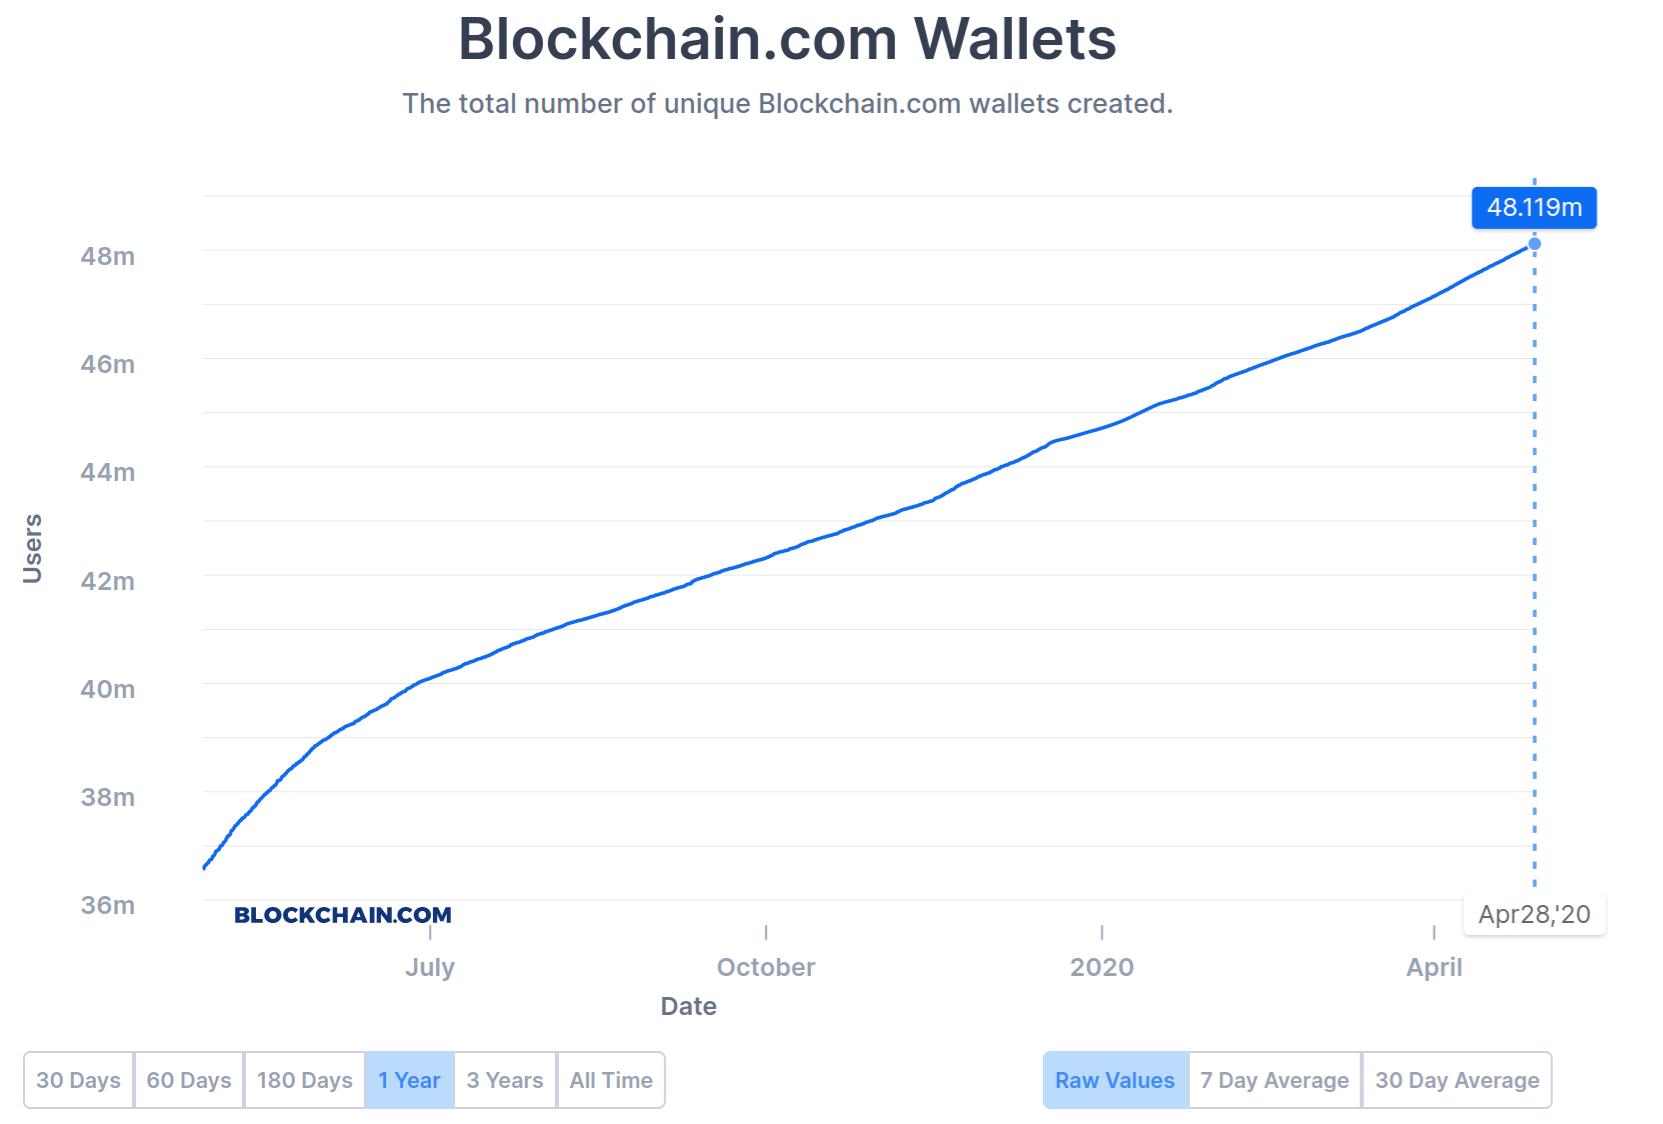 Bitcoin (BTC) Outperforming S&P 500 on Crypto Market Rally As Blockchain Wallets Top 48 Million